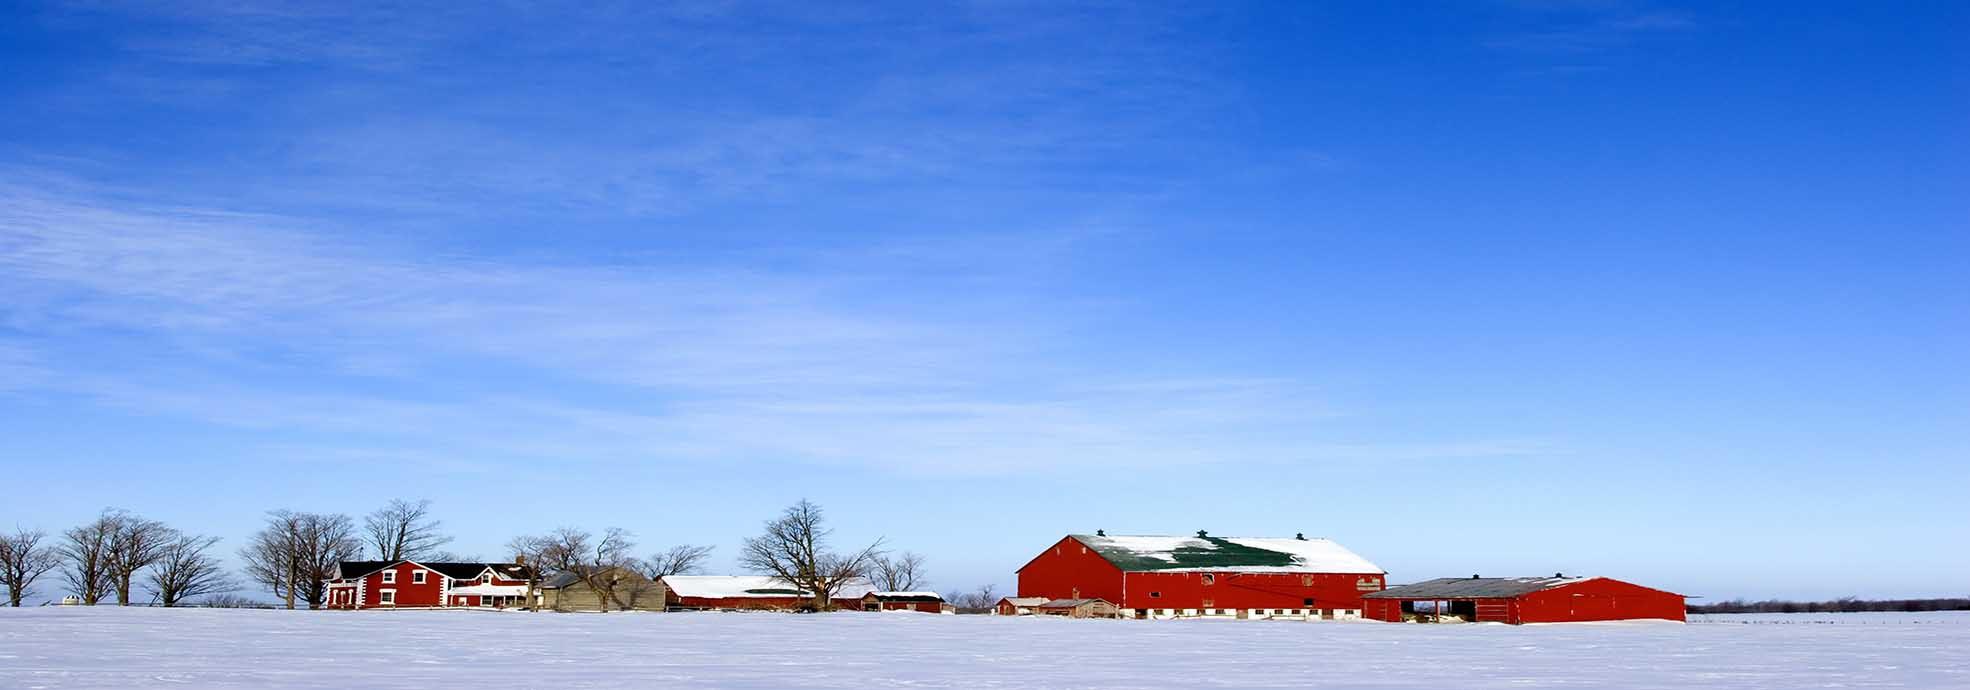 http://www.inderamills.com/wp-content/uploads/2015/08/winter-landscape-slider-wpcf_1970x690.jpg